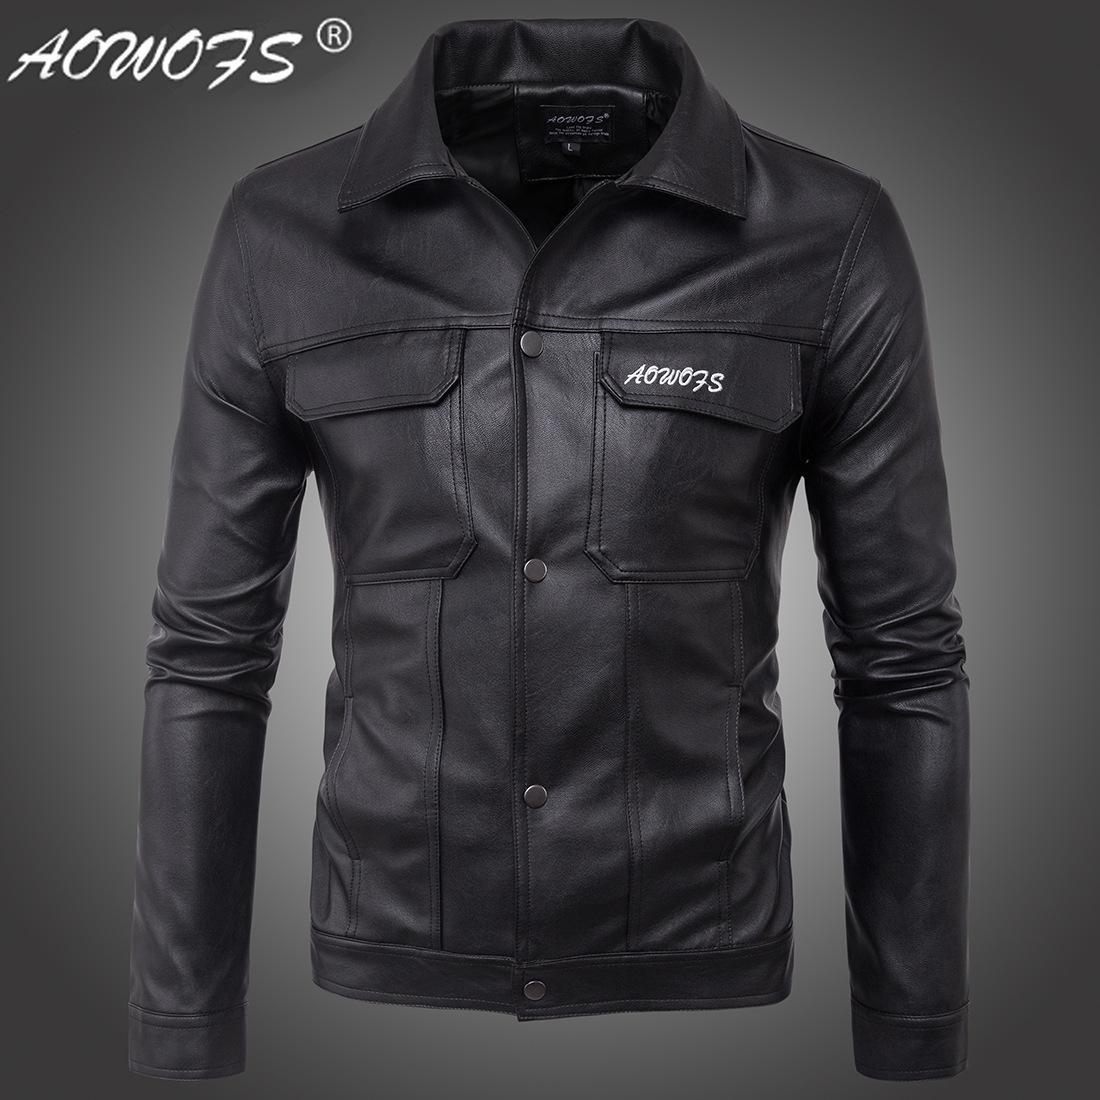 Europäische große neue Herren-Motorrad-Lederjacke Brief bestickte Lederjacke Jacke D105